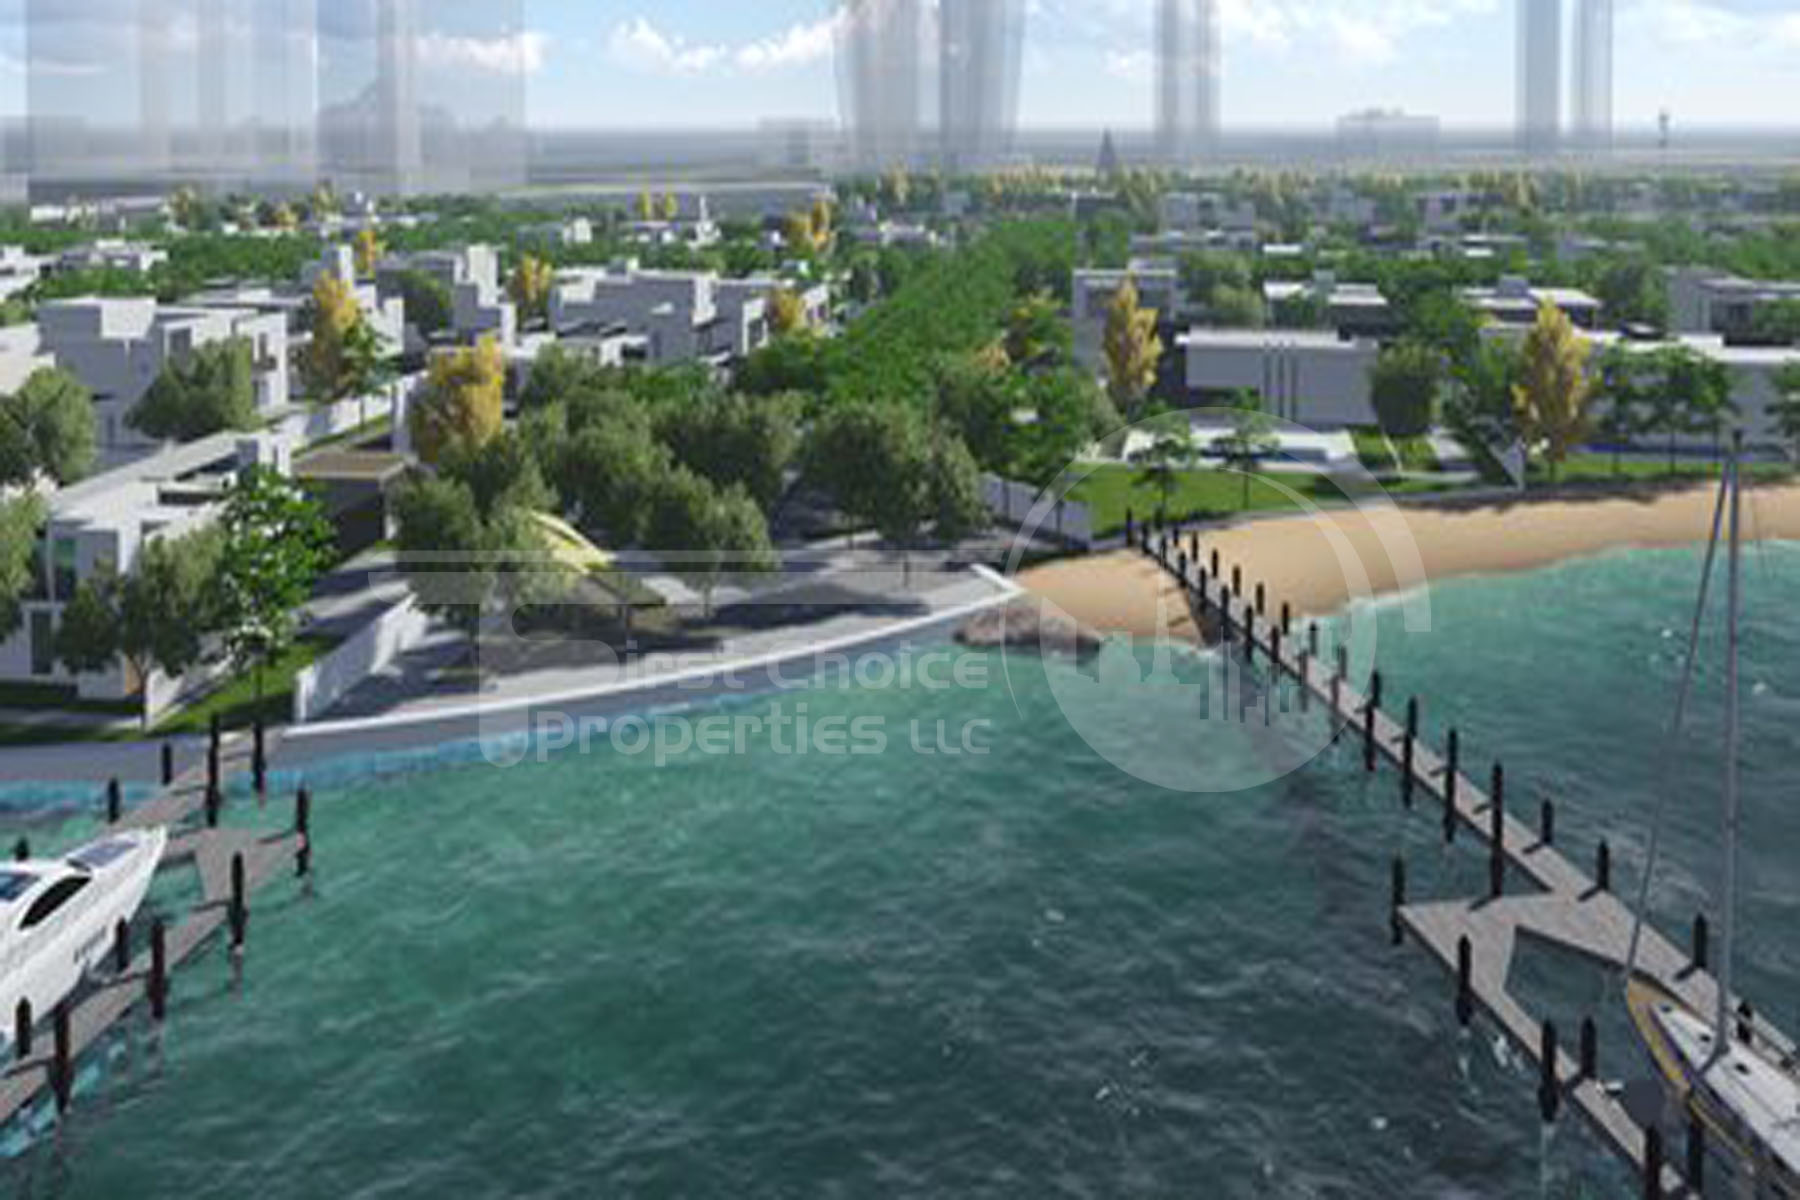 Residential Island - Nareel Island - Al Bateen - Abu Dhabi - UAE (11).jpg